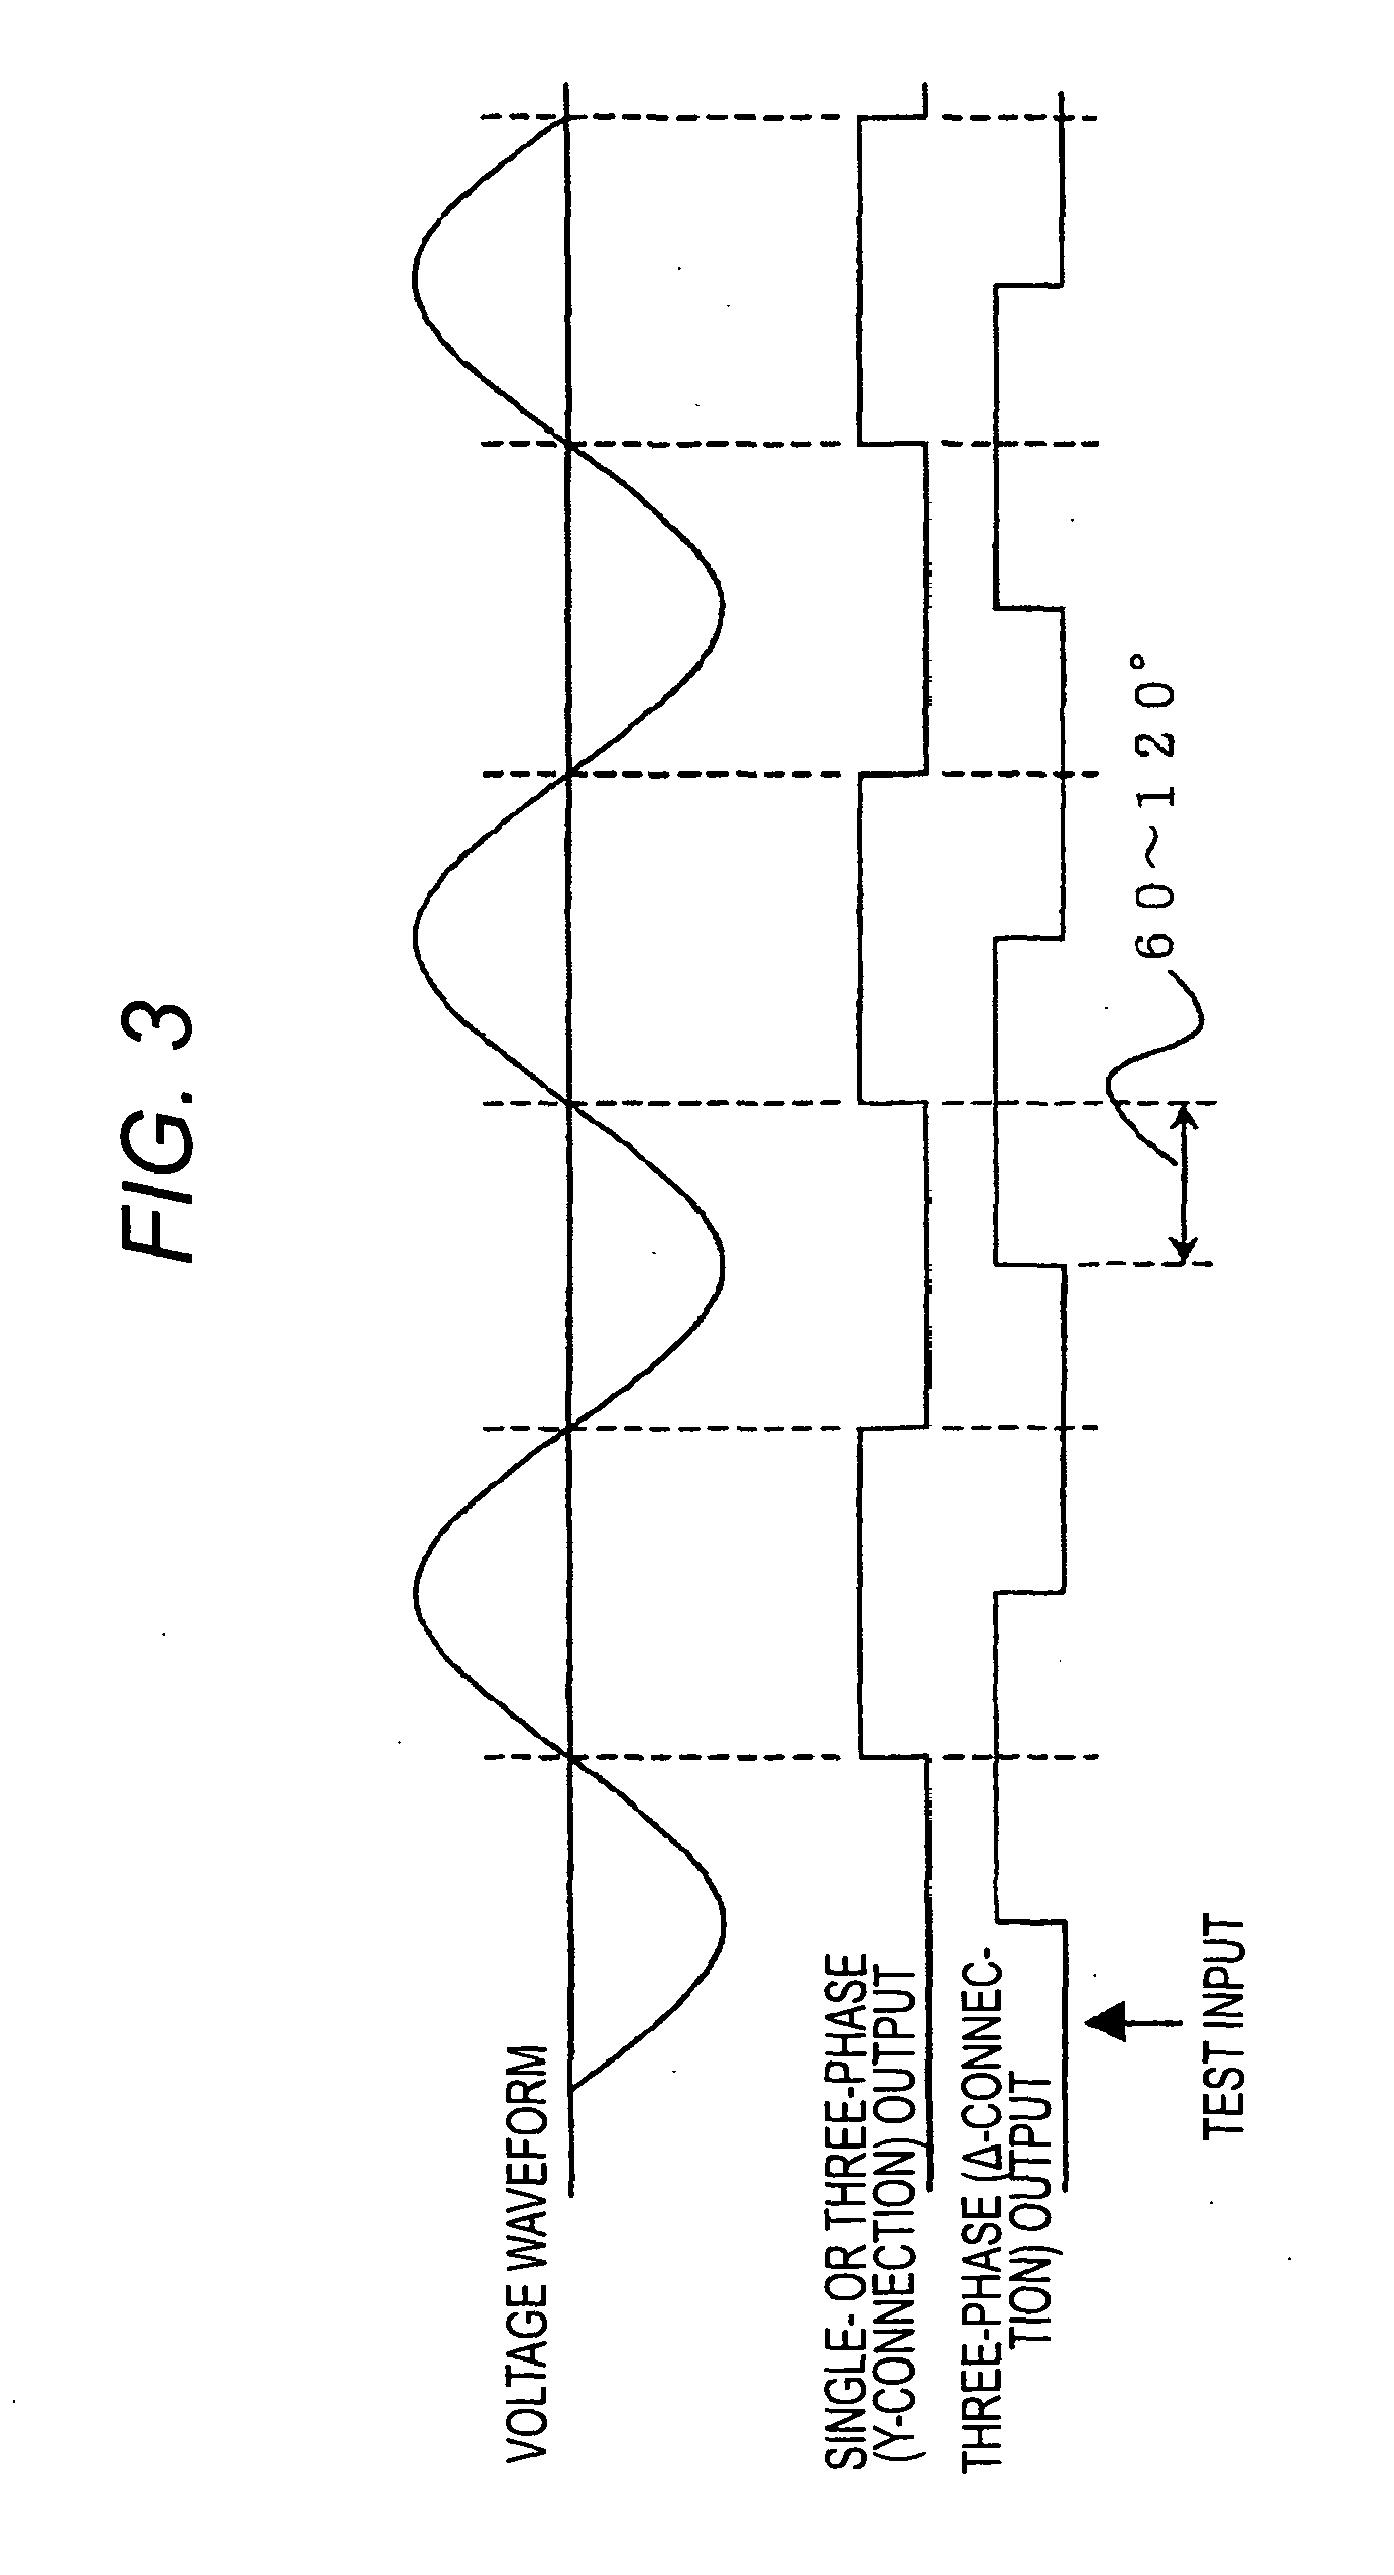 patent ep2211437a2